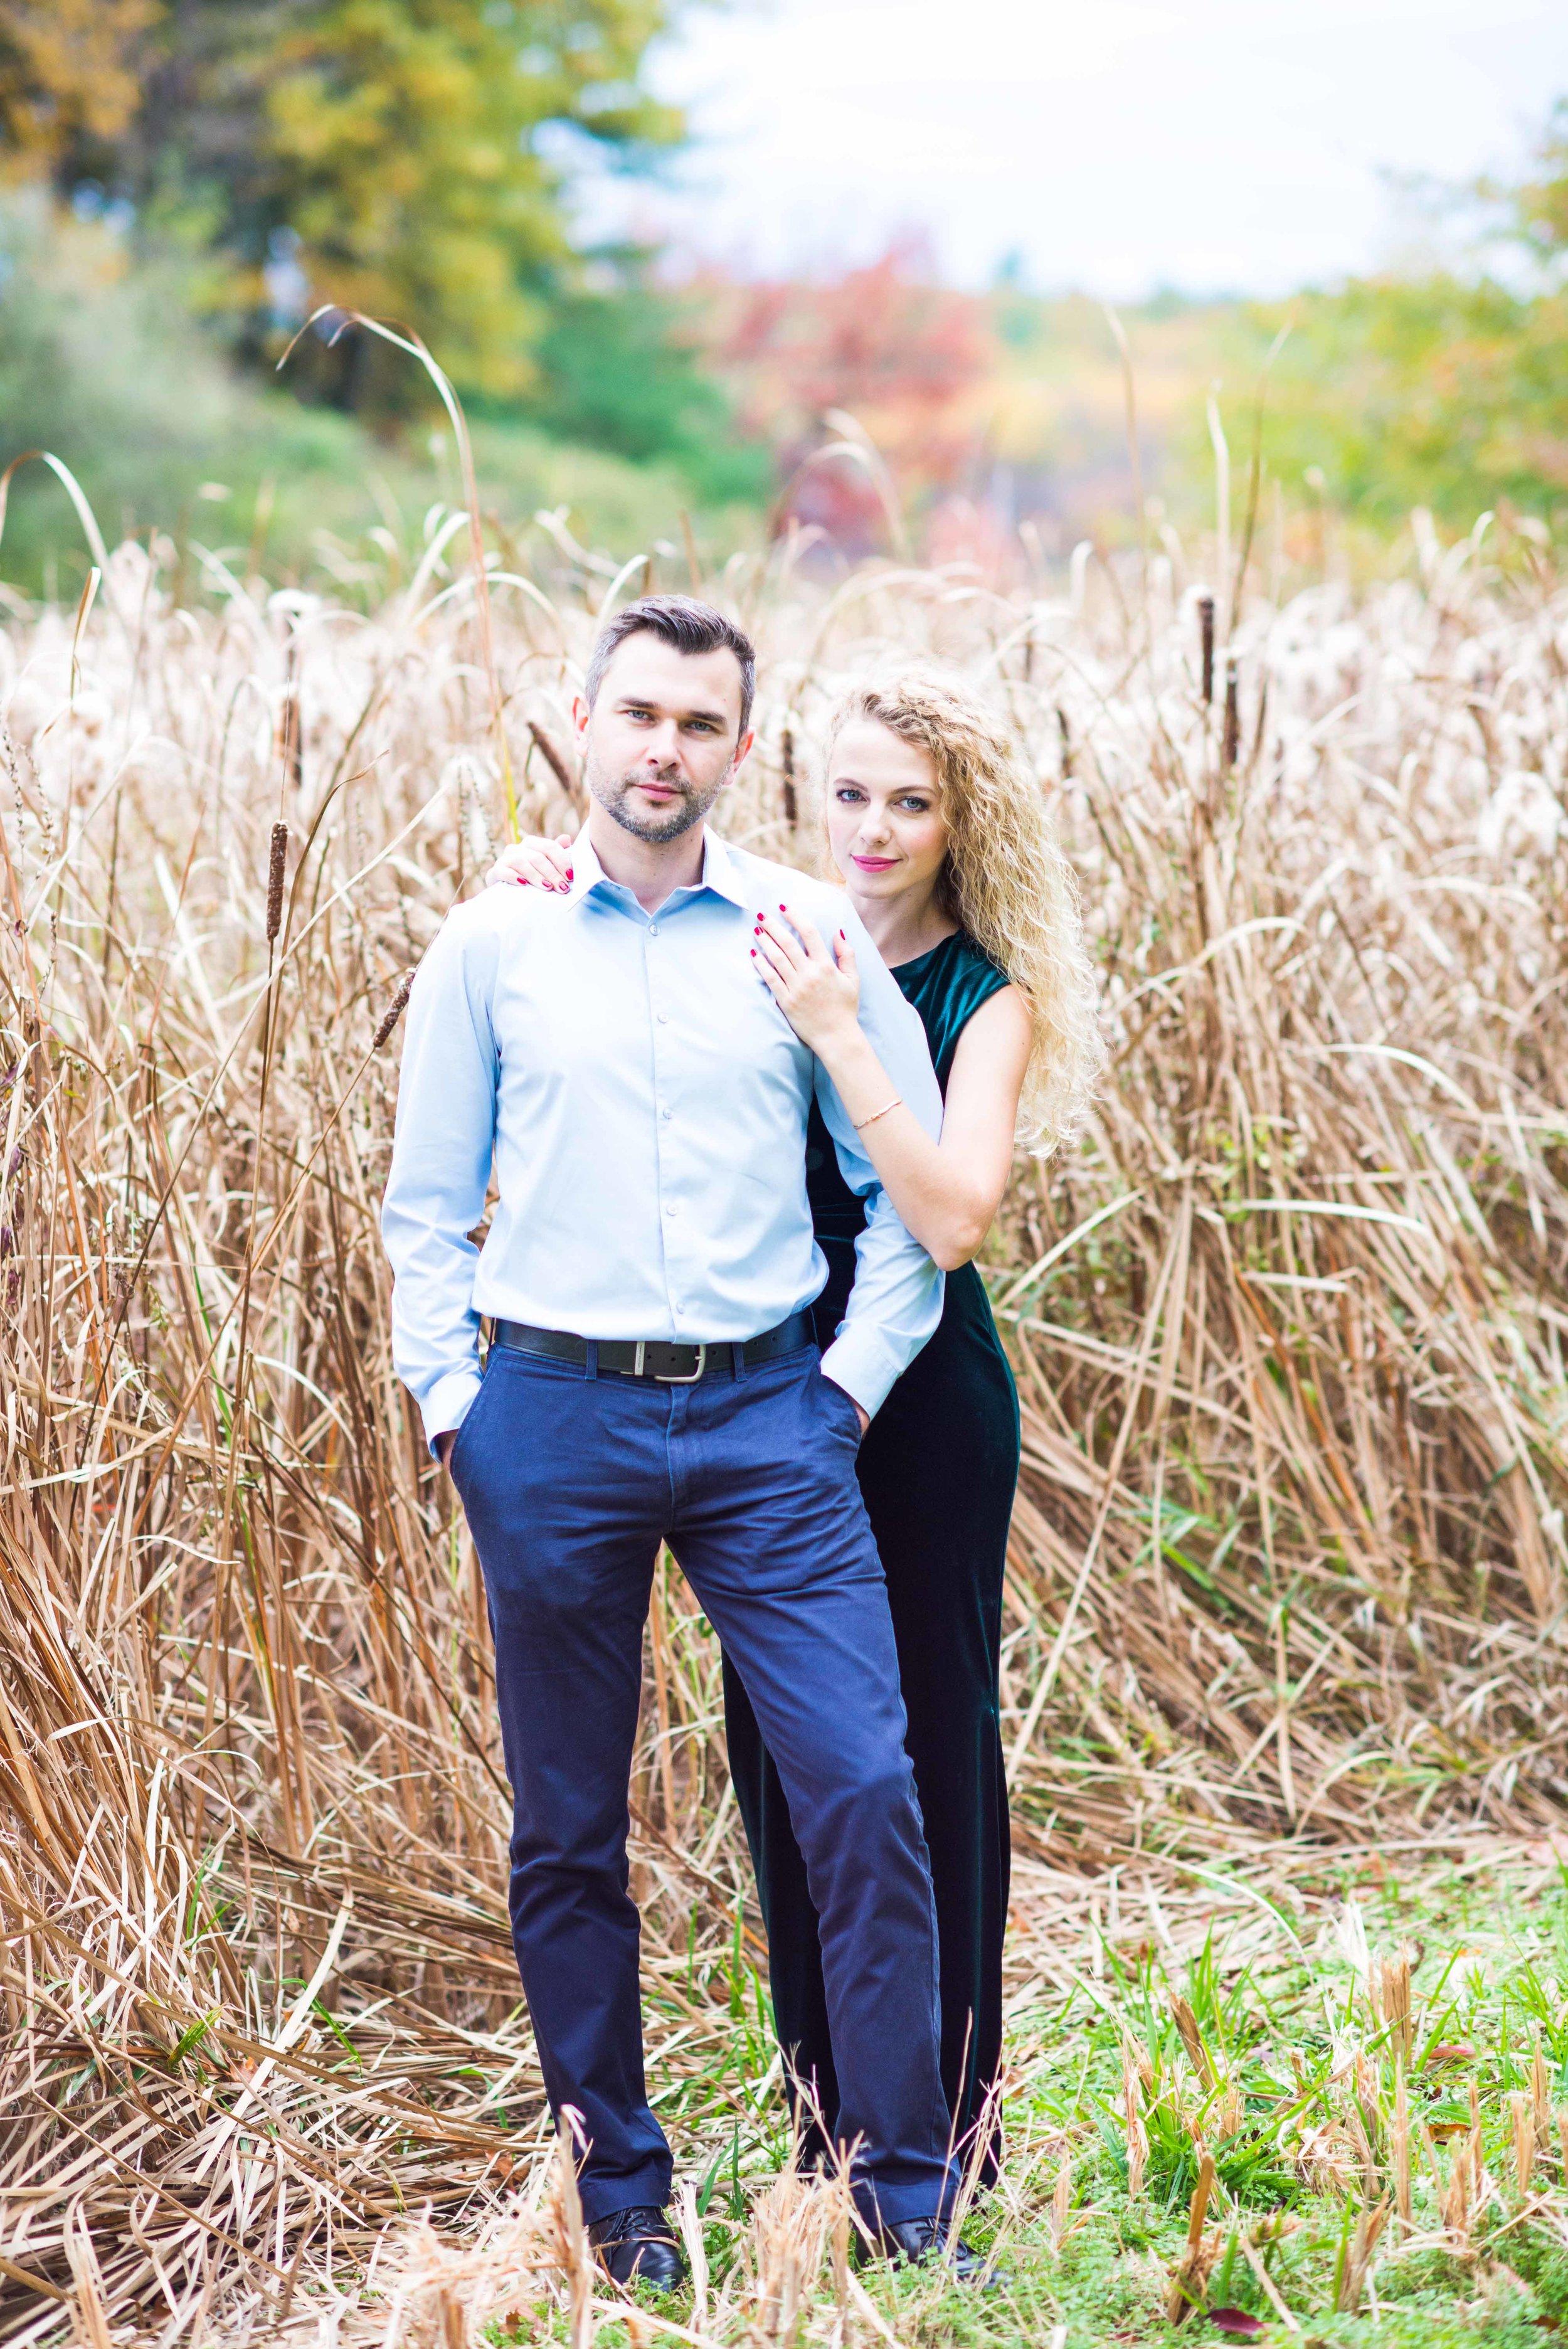 Iryna's Photography | Boston Wedding Photographer | New England Weddings